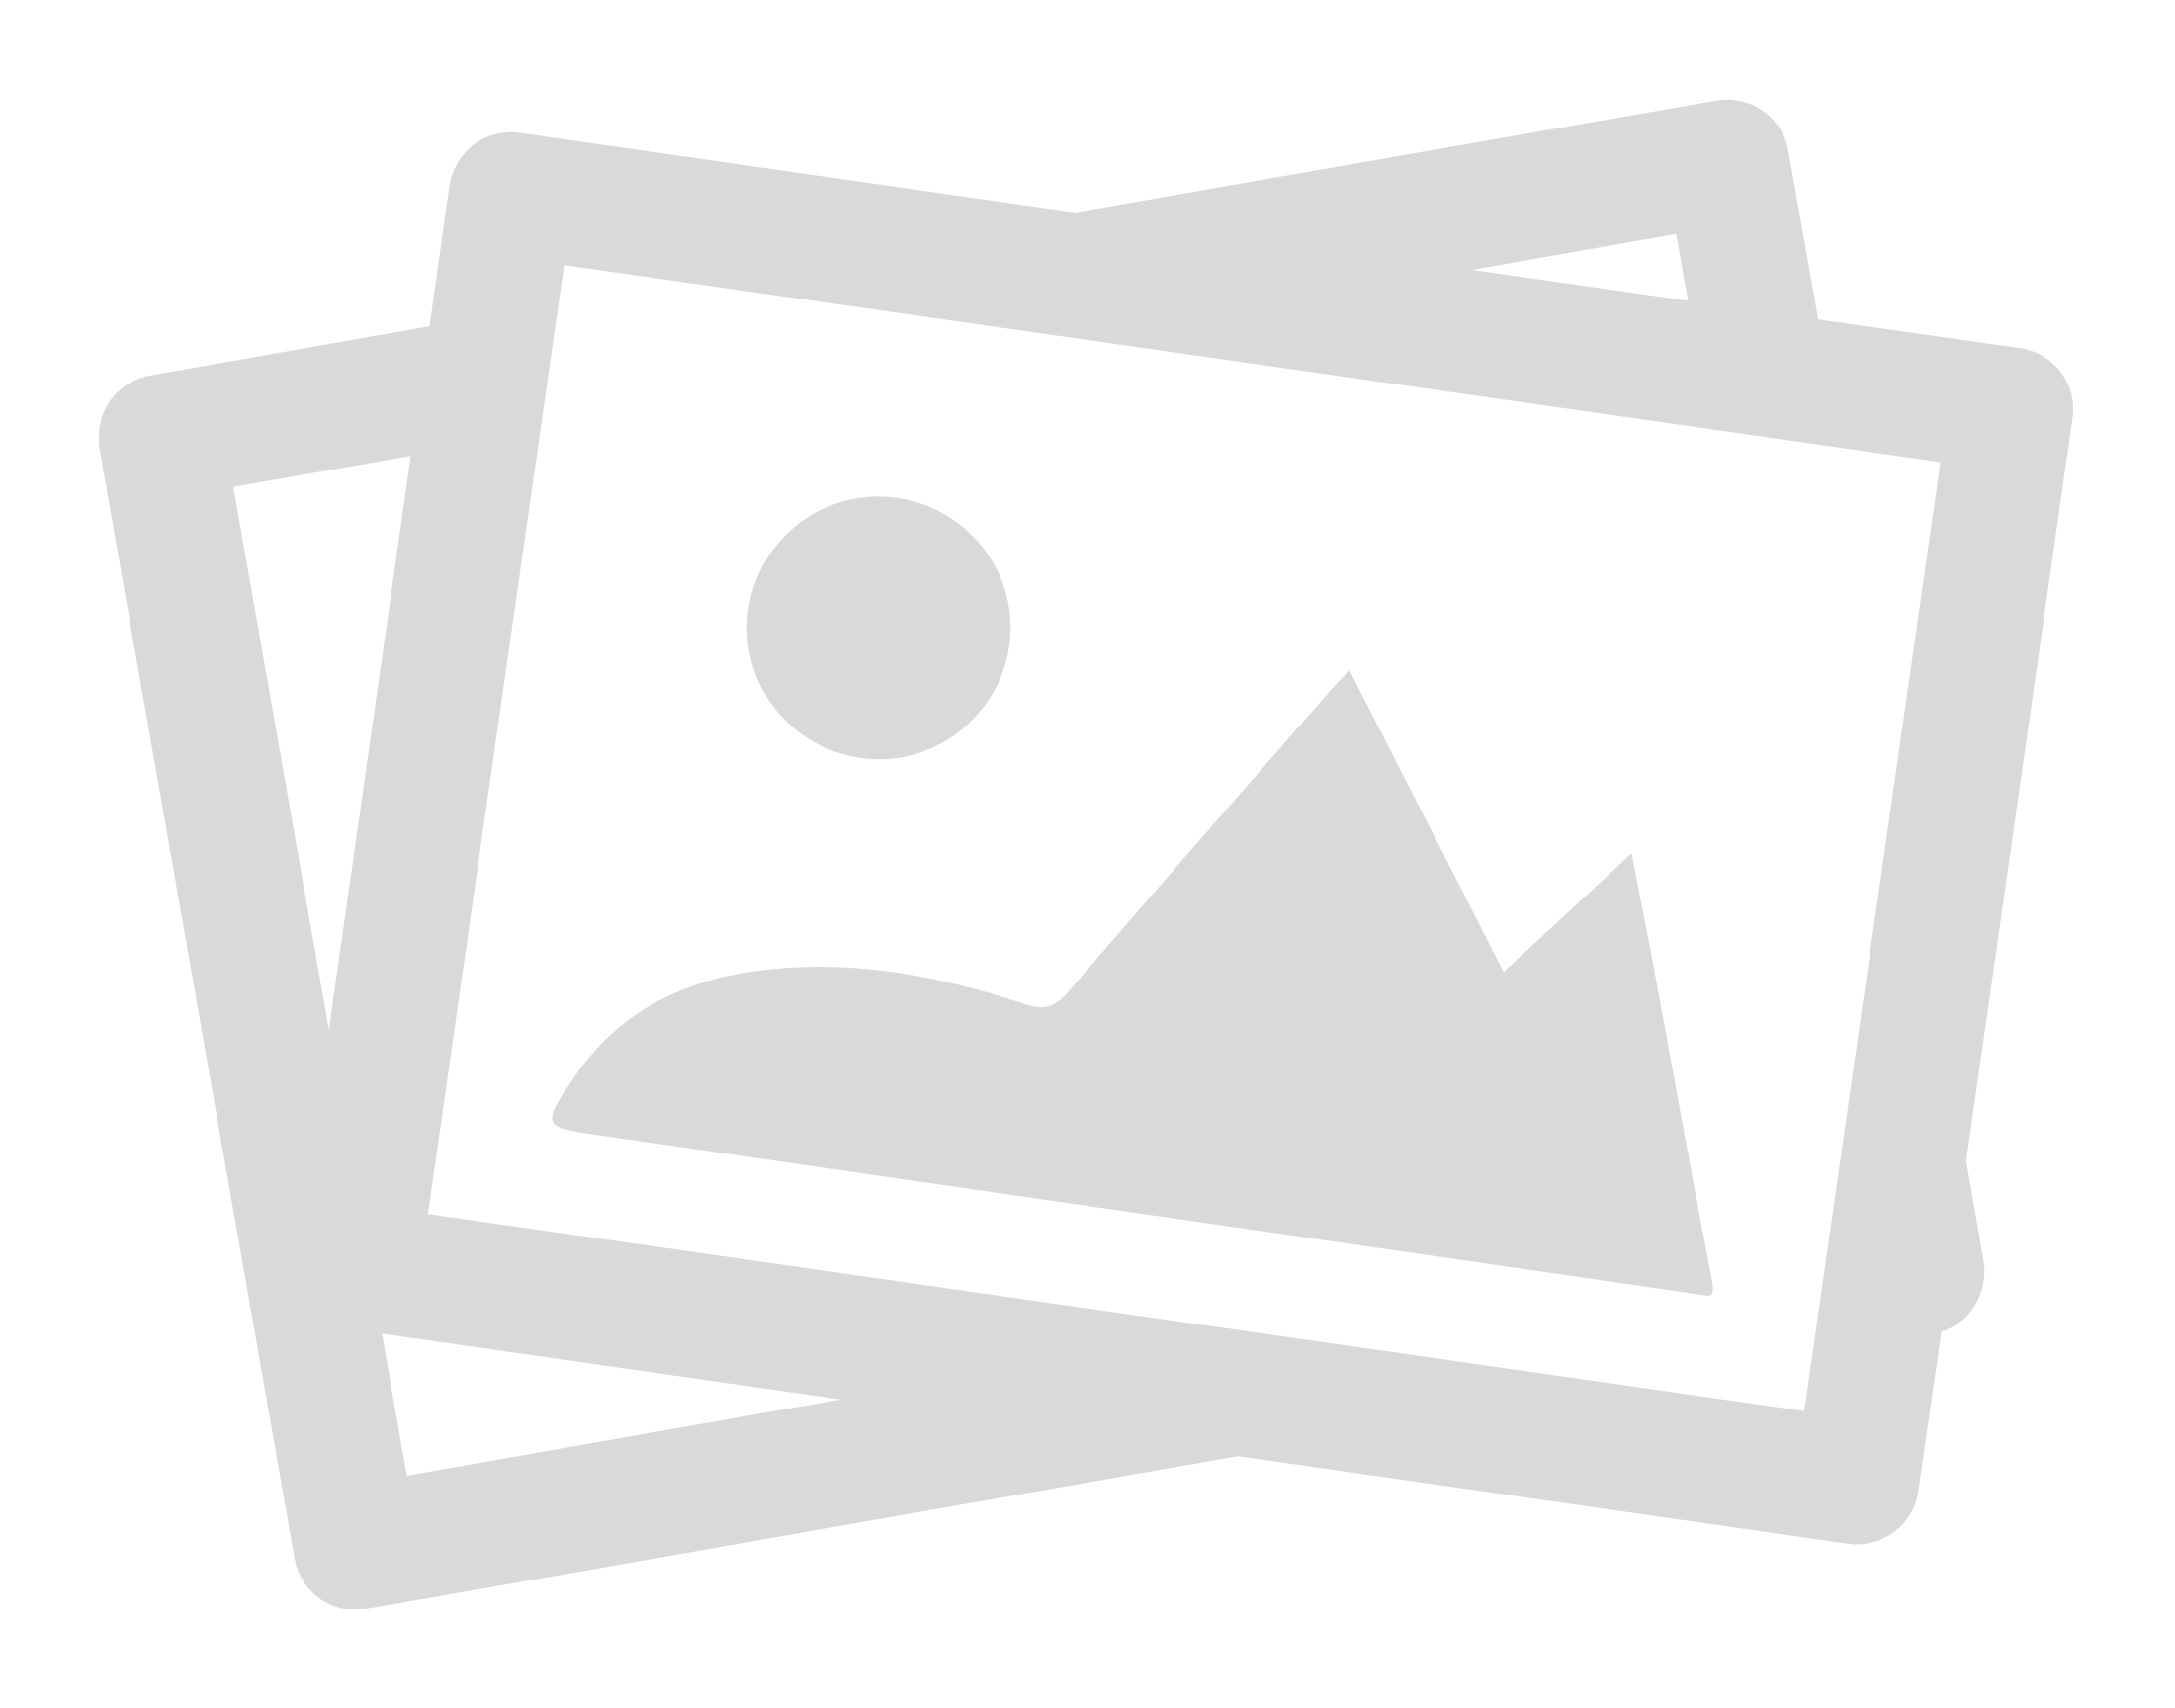 Image of   Etniske Minoriteter - E-bog (pdf-format) - af Jens Hjort Andersen, Anne Dorthe Roland Jensen, Sami Zitawi, Beth Elverdam, Sascha Rismankar Qvortrup, Amneh Hawwa, Edith Montgomery, Ebbe Munk-Andersen, Helle Kirud